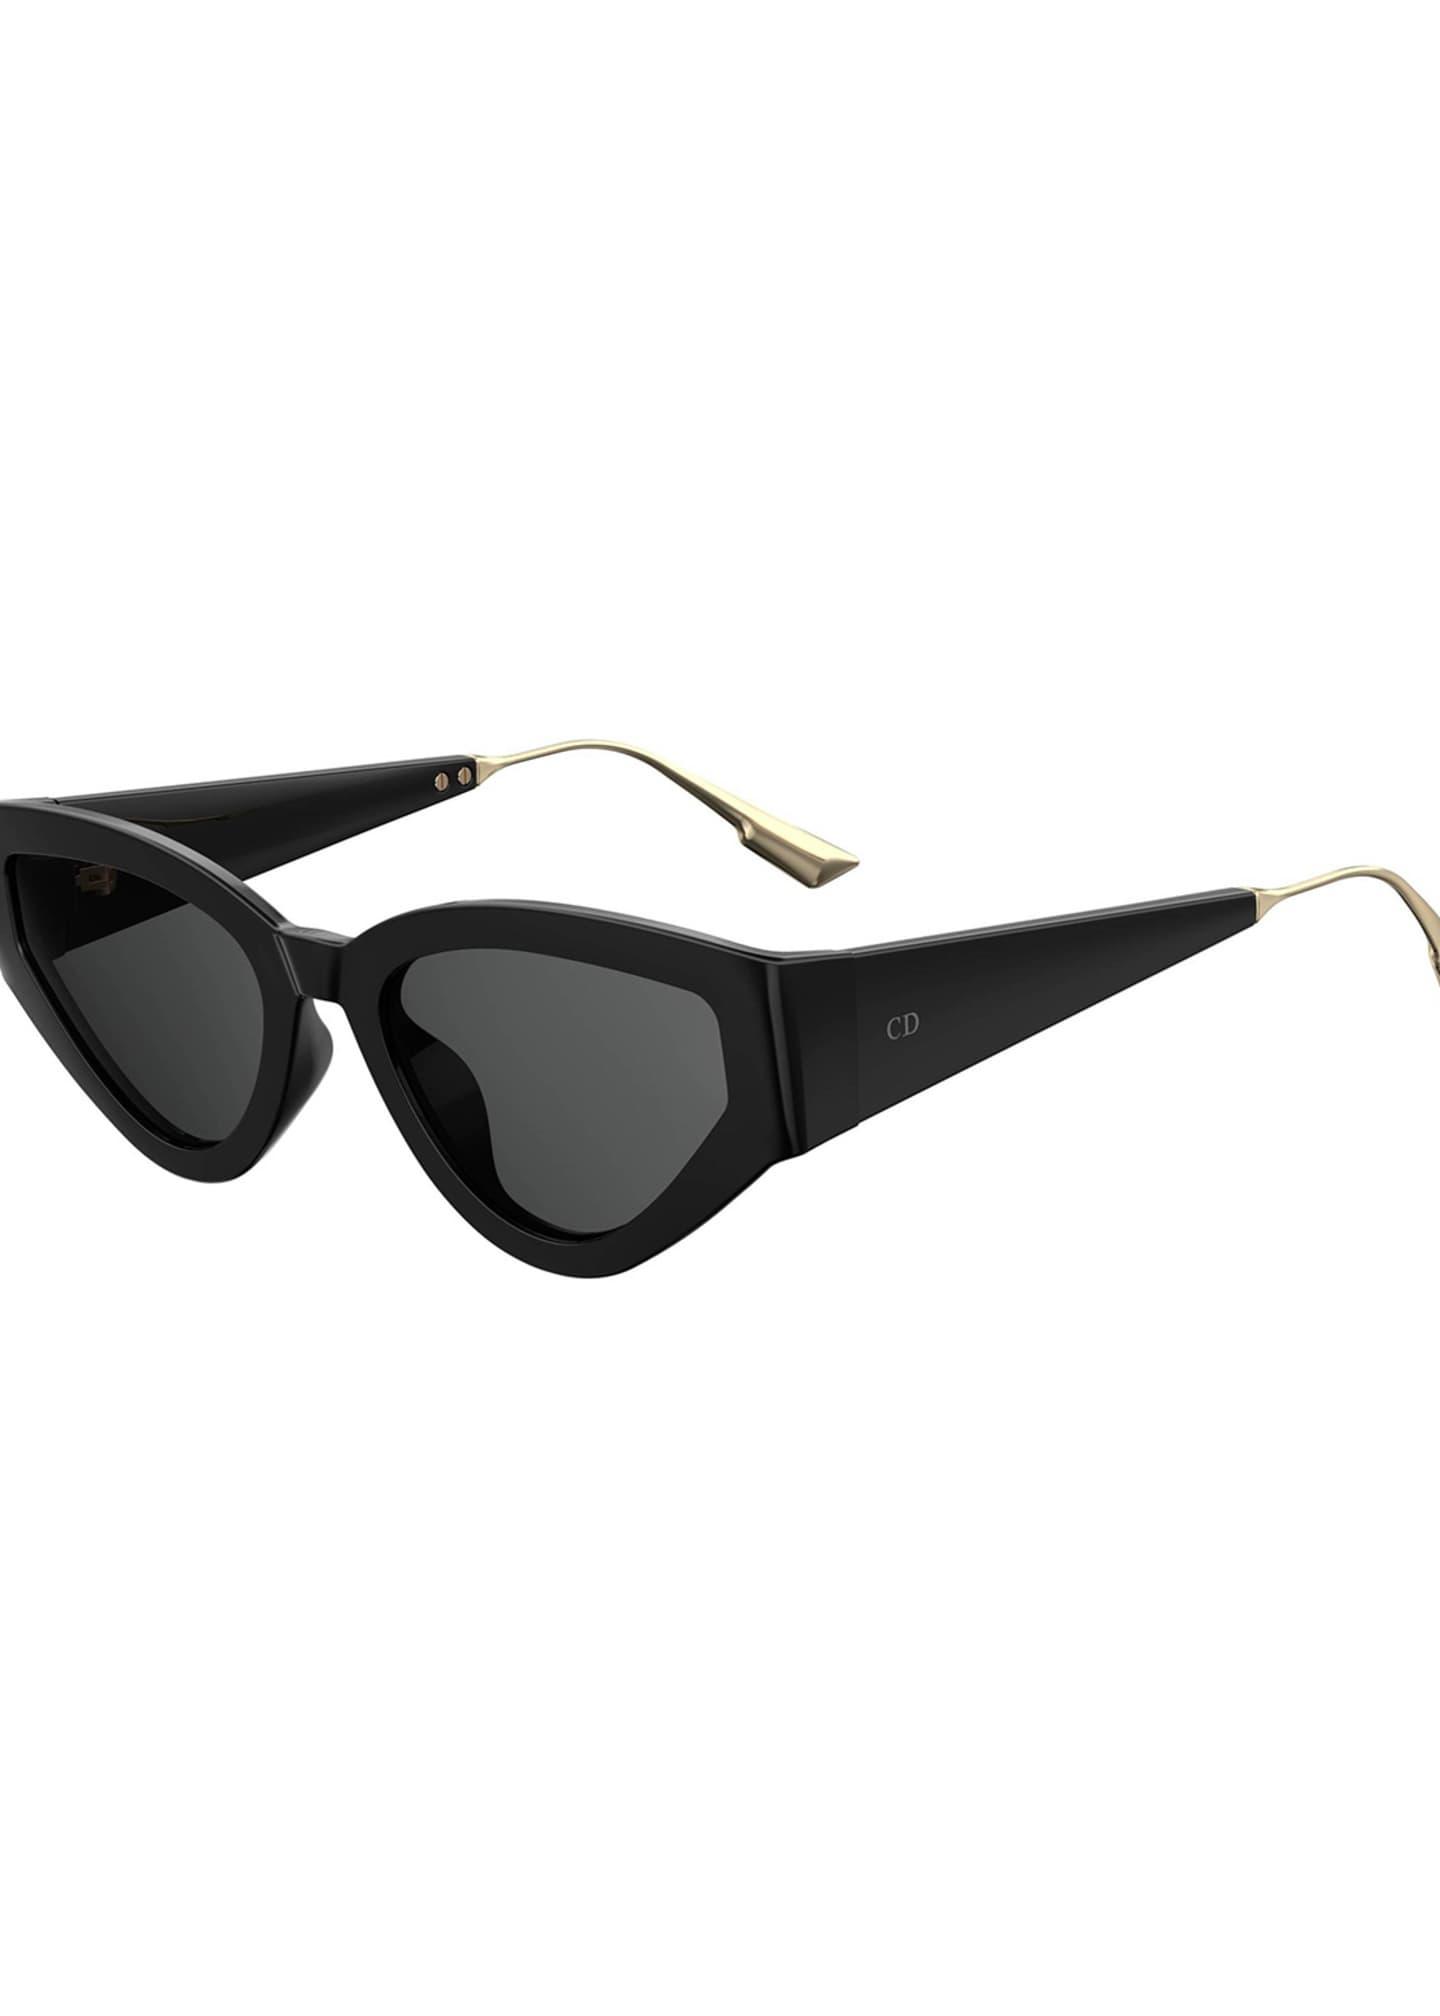 CatStyleDior1 Cat-Eye Sunglasses